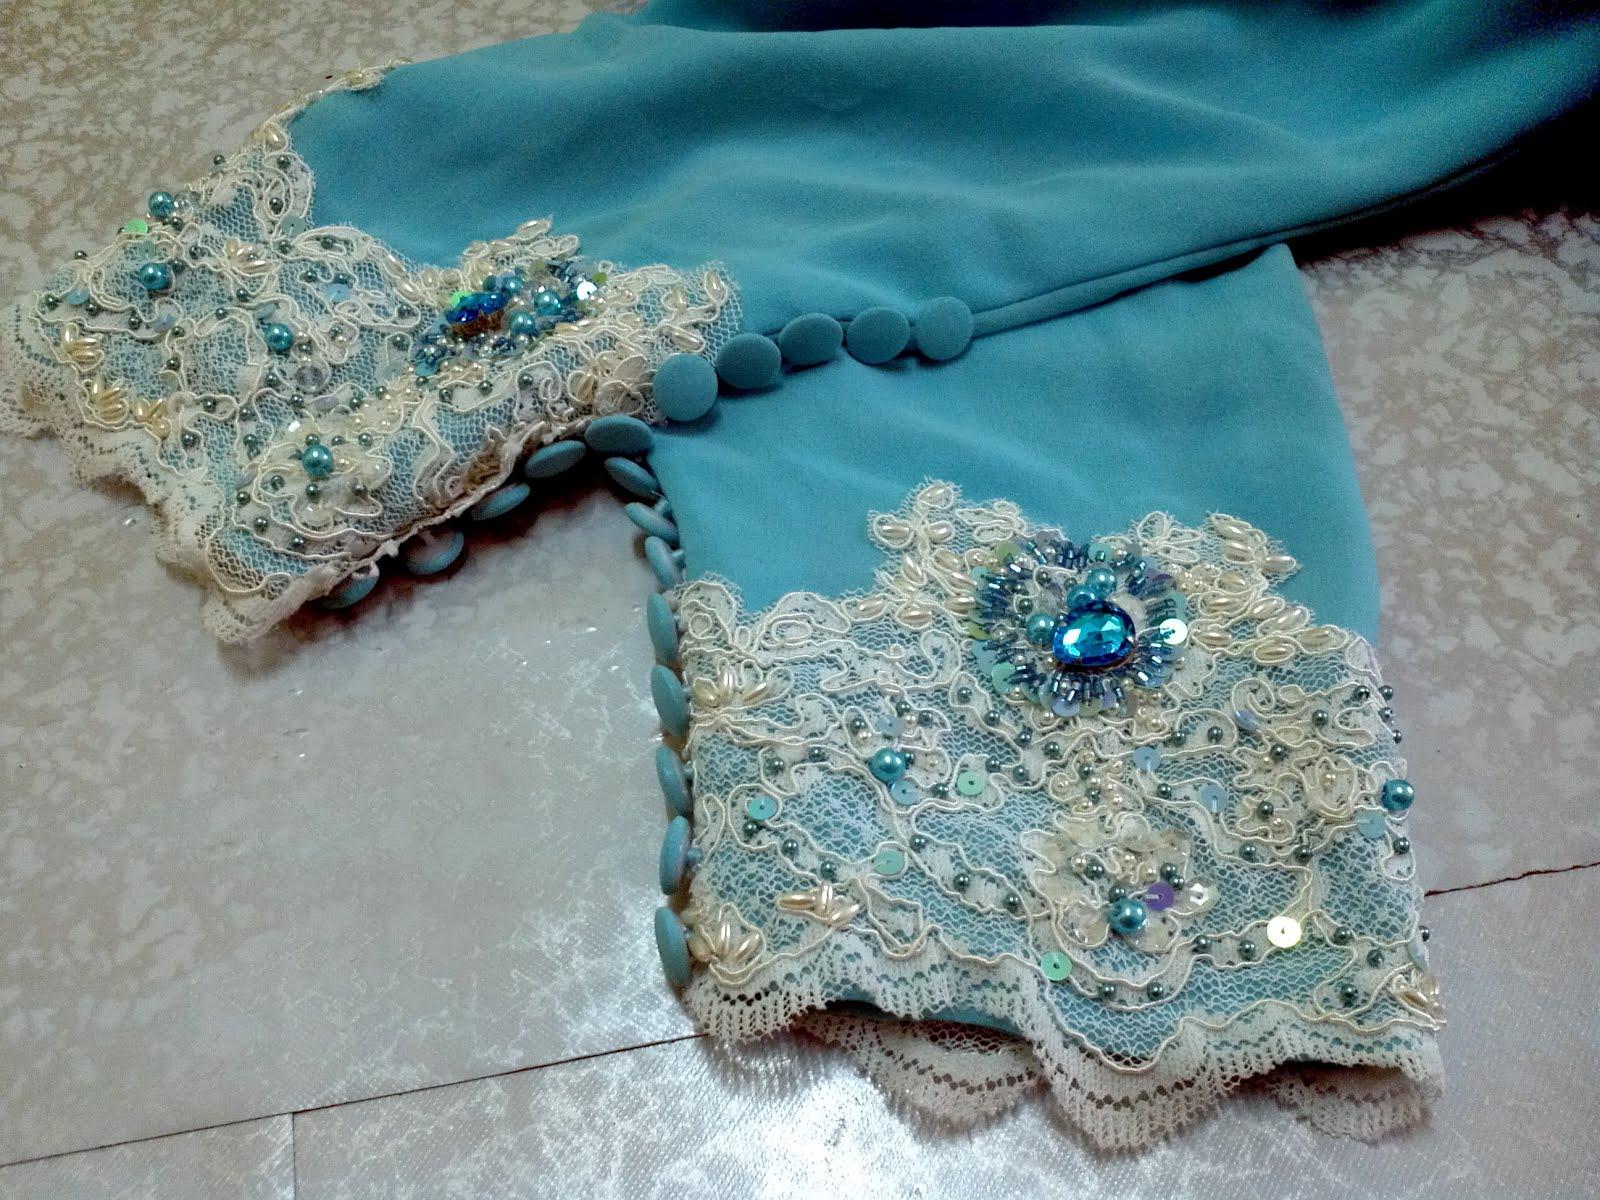 Jahitan MANIKqueen: lace putih jait manik pearl,swaroski,diamond